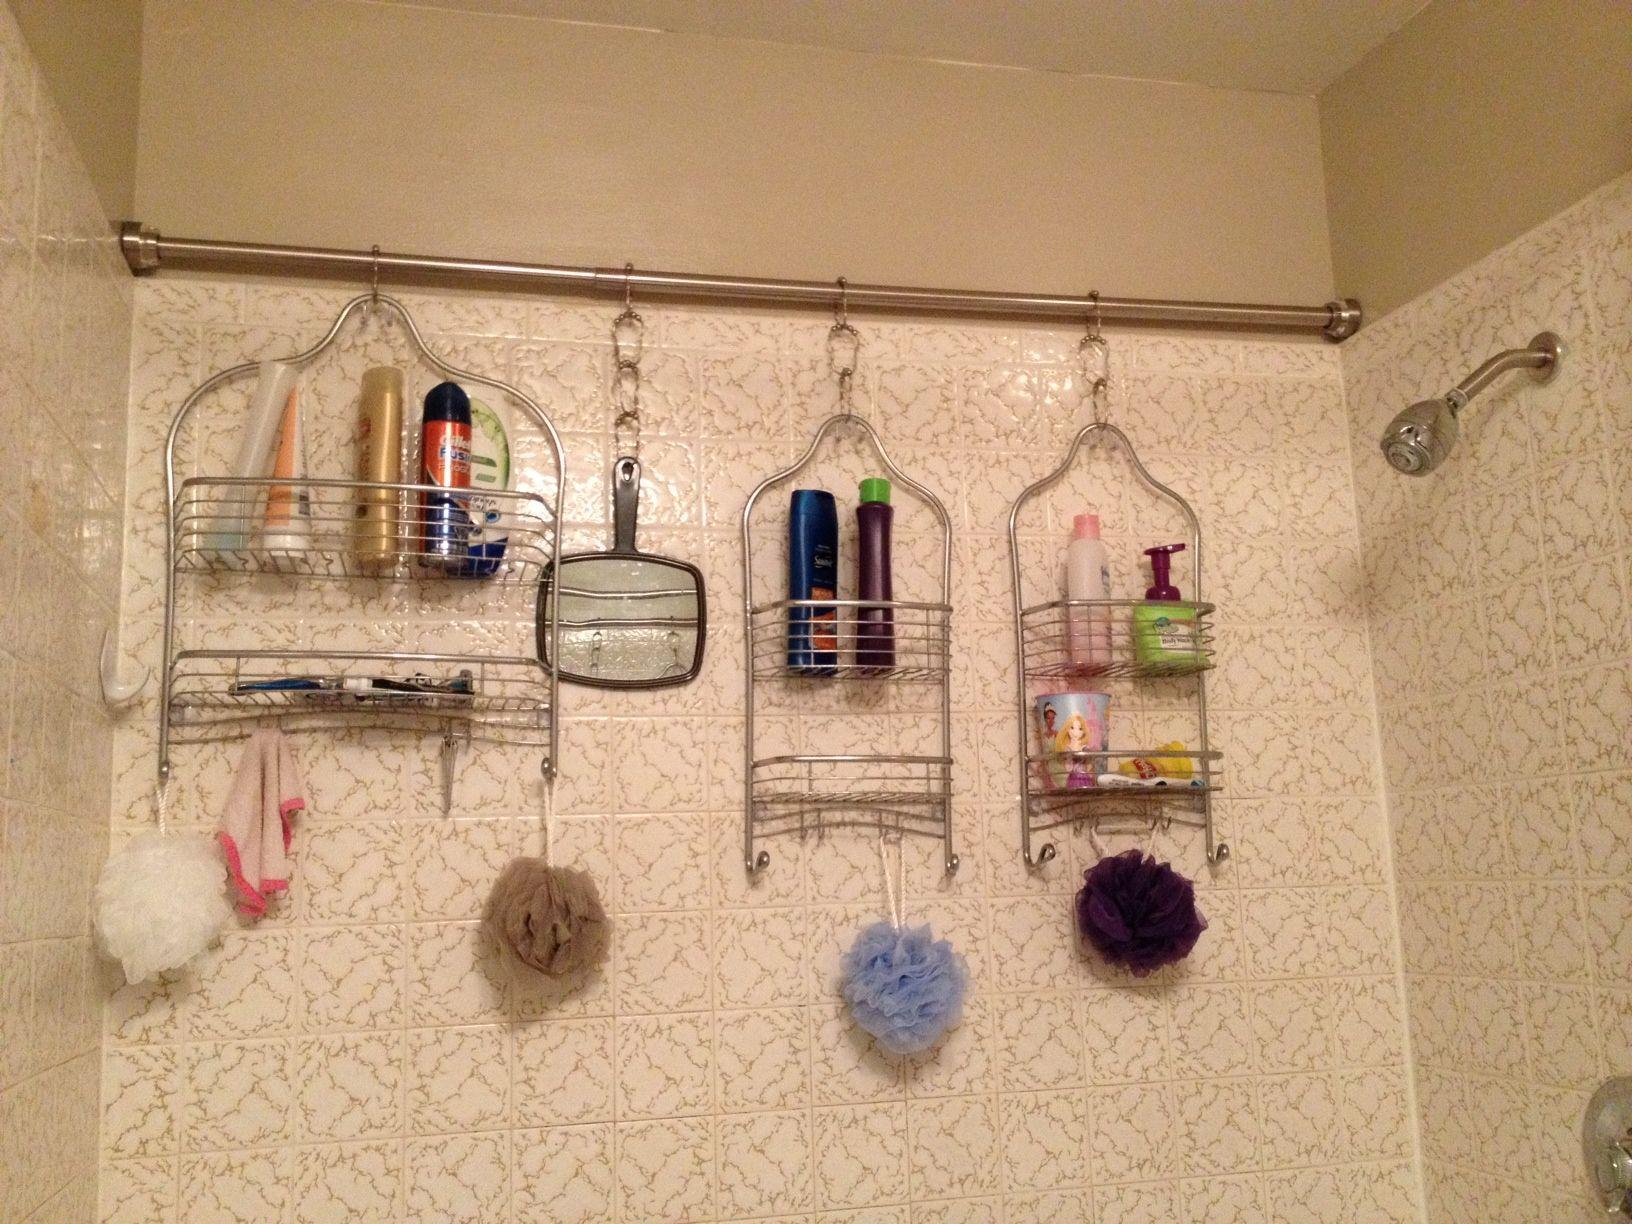 Sharing a shower